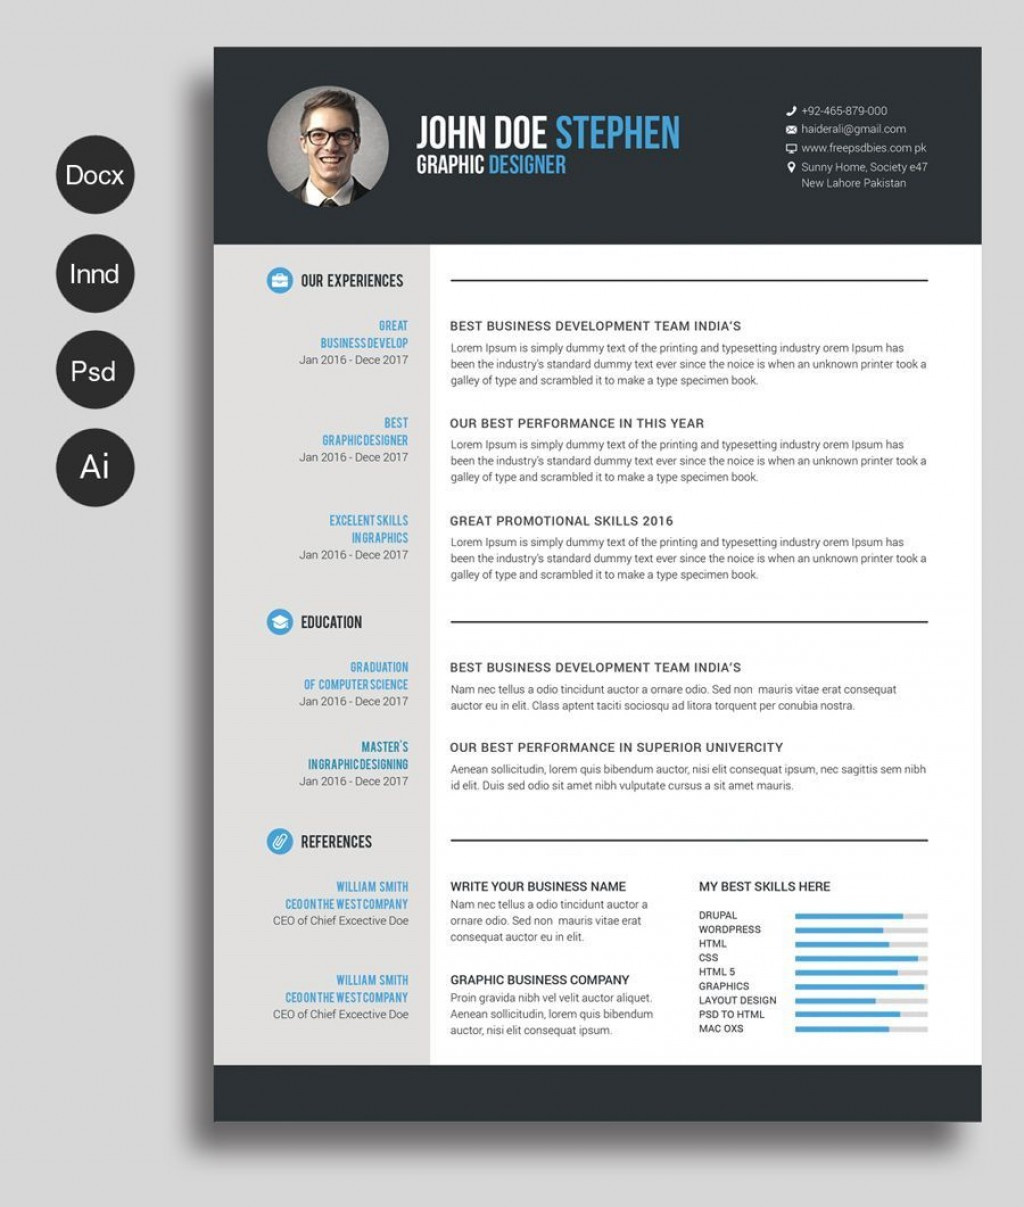 001 Stirring Free Microsoft Word Resume Template Idea  Templates Modern For DownloadLarge